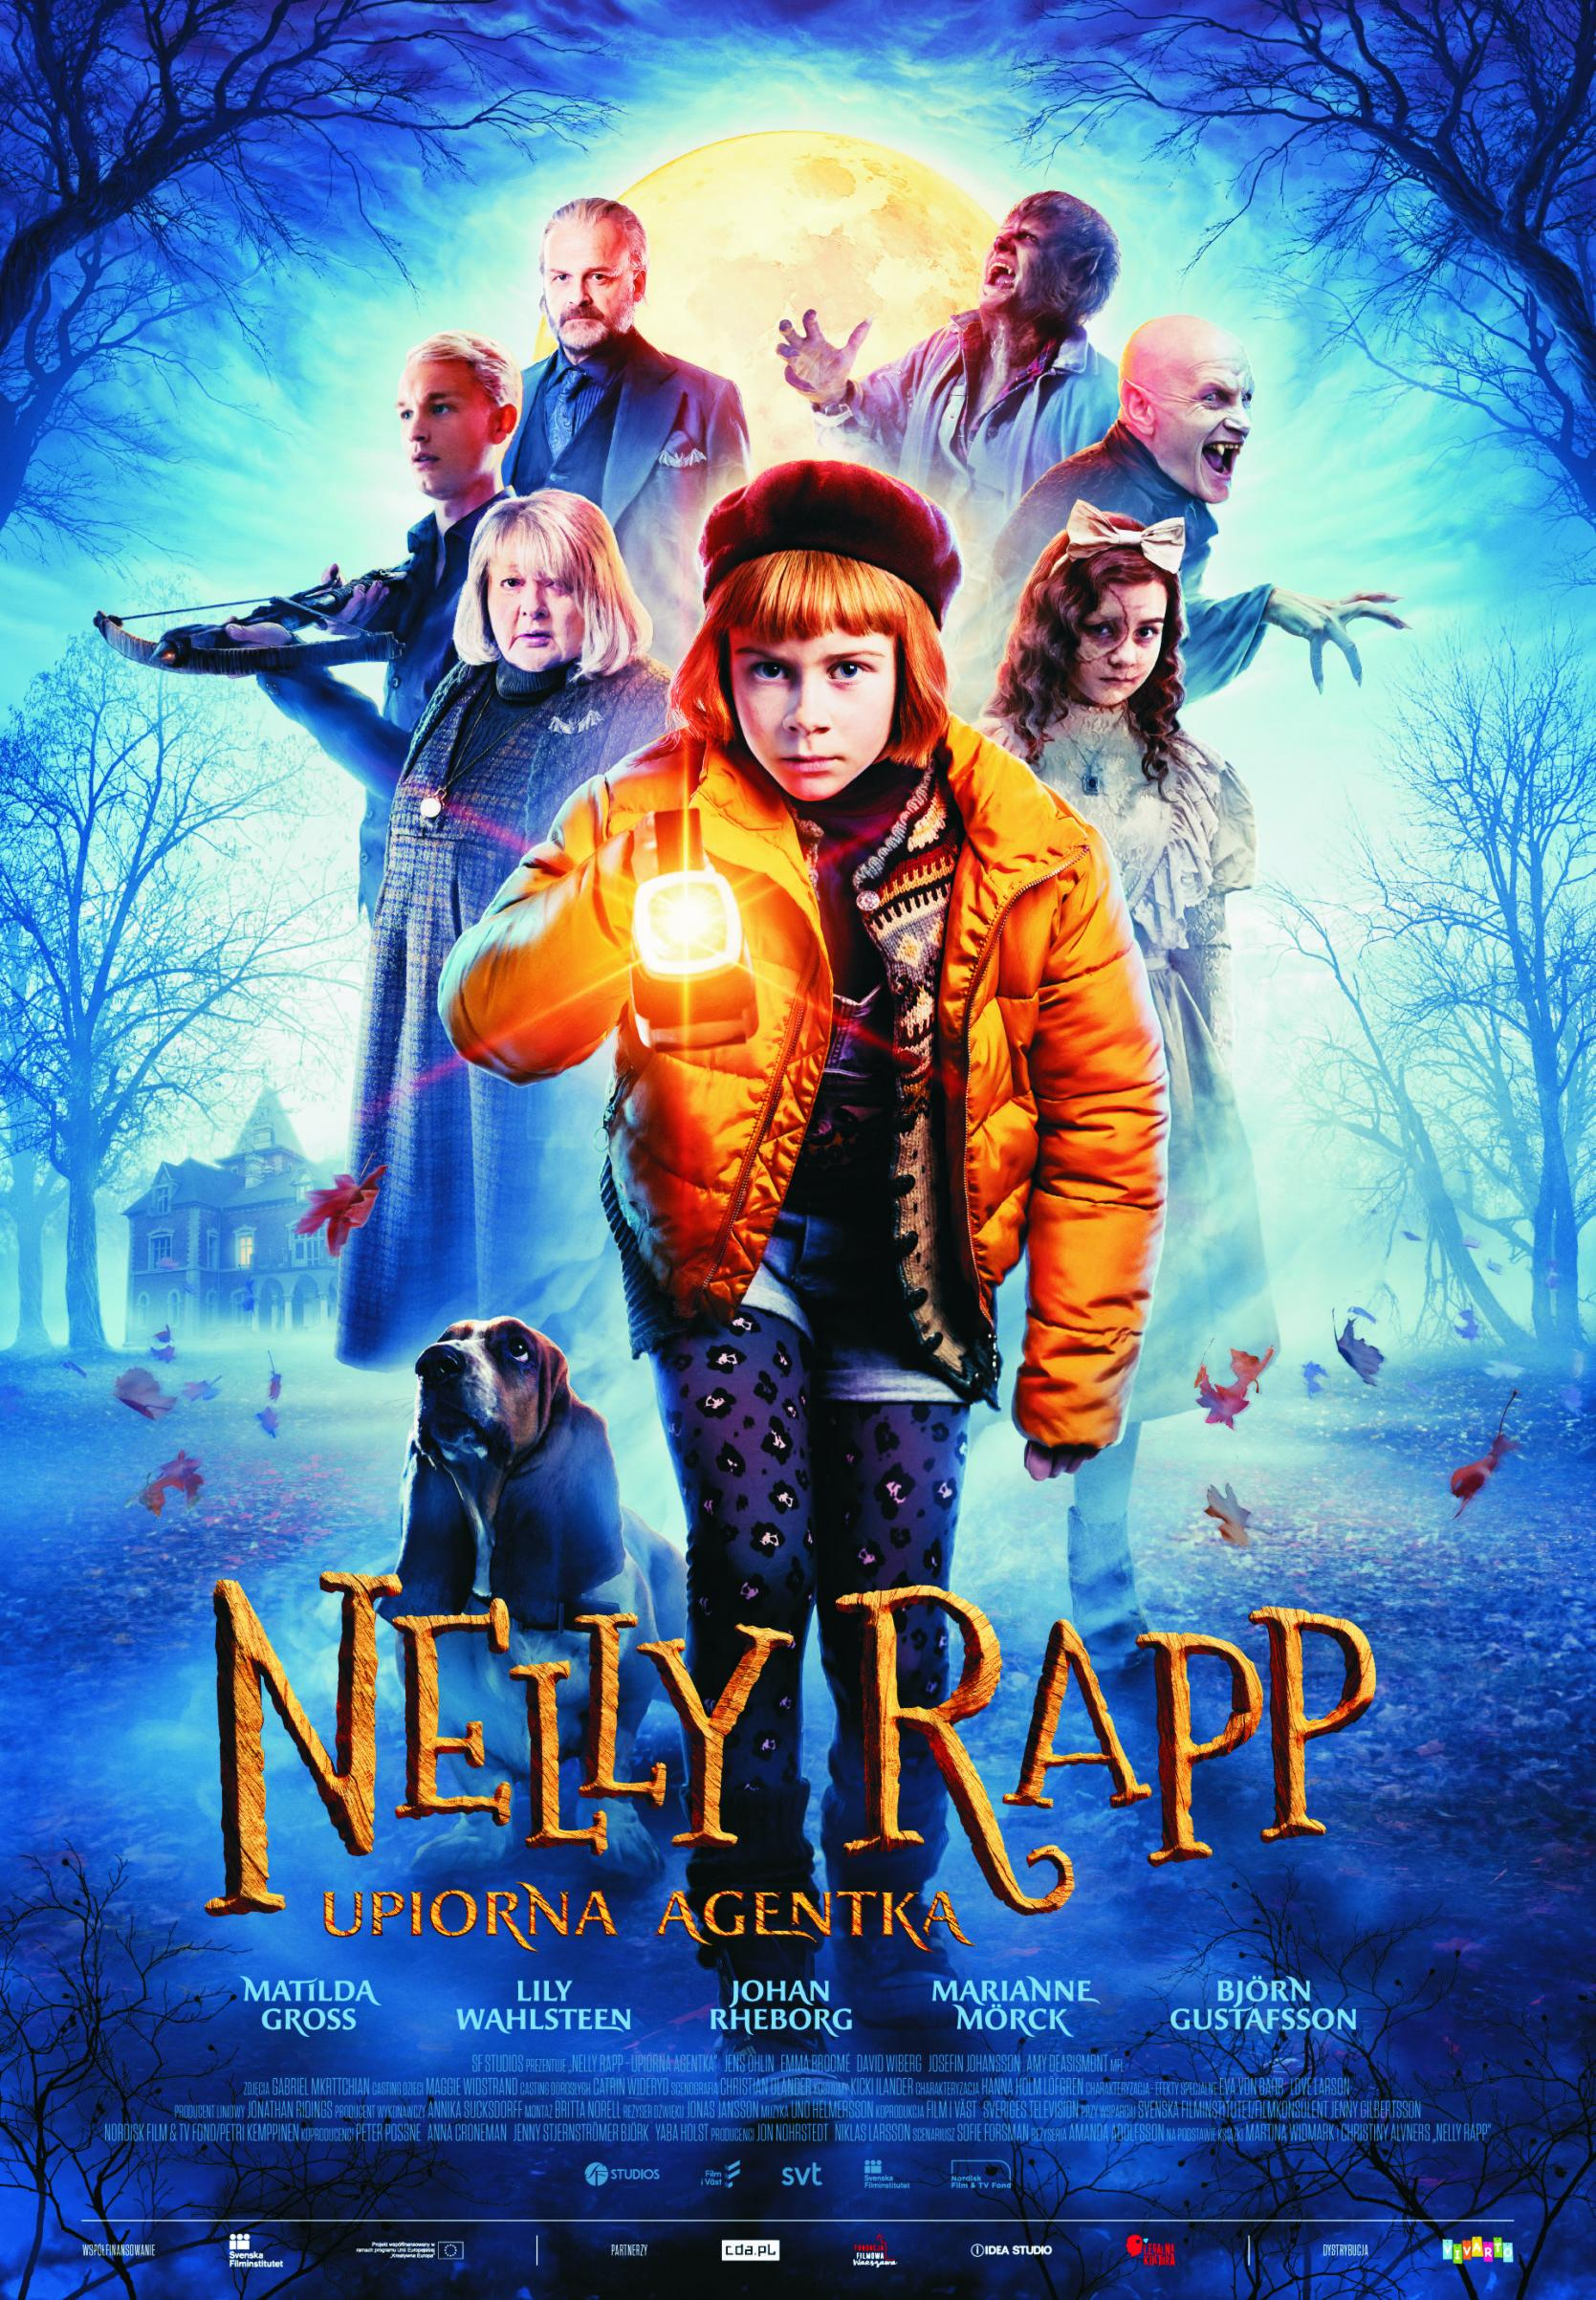 Nelly Rapp - upiorna agentka (dubbing)